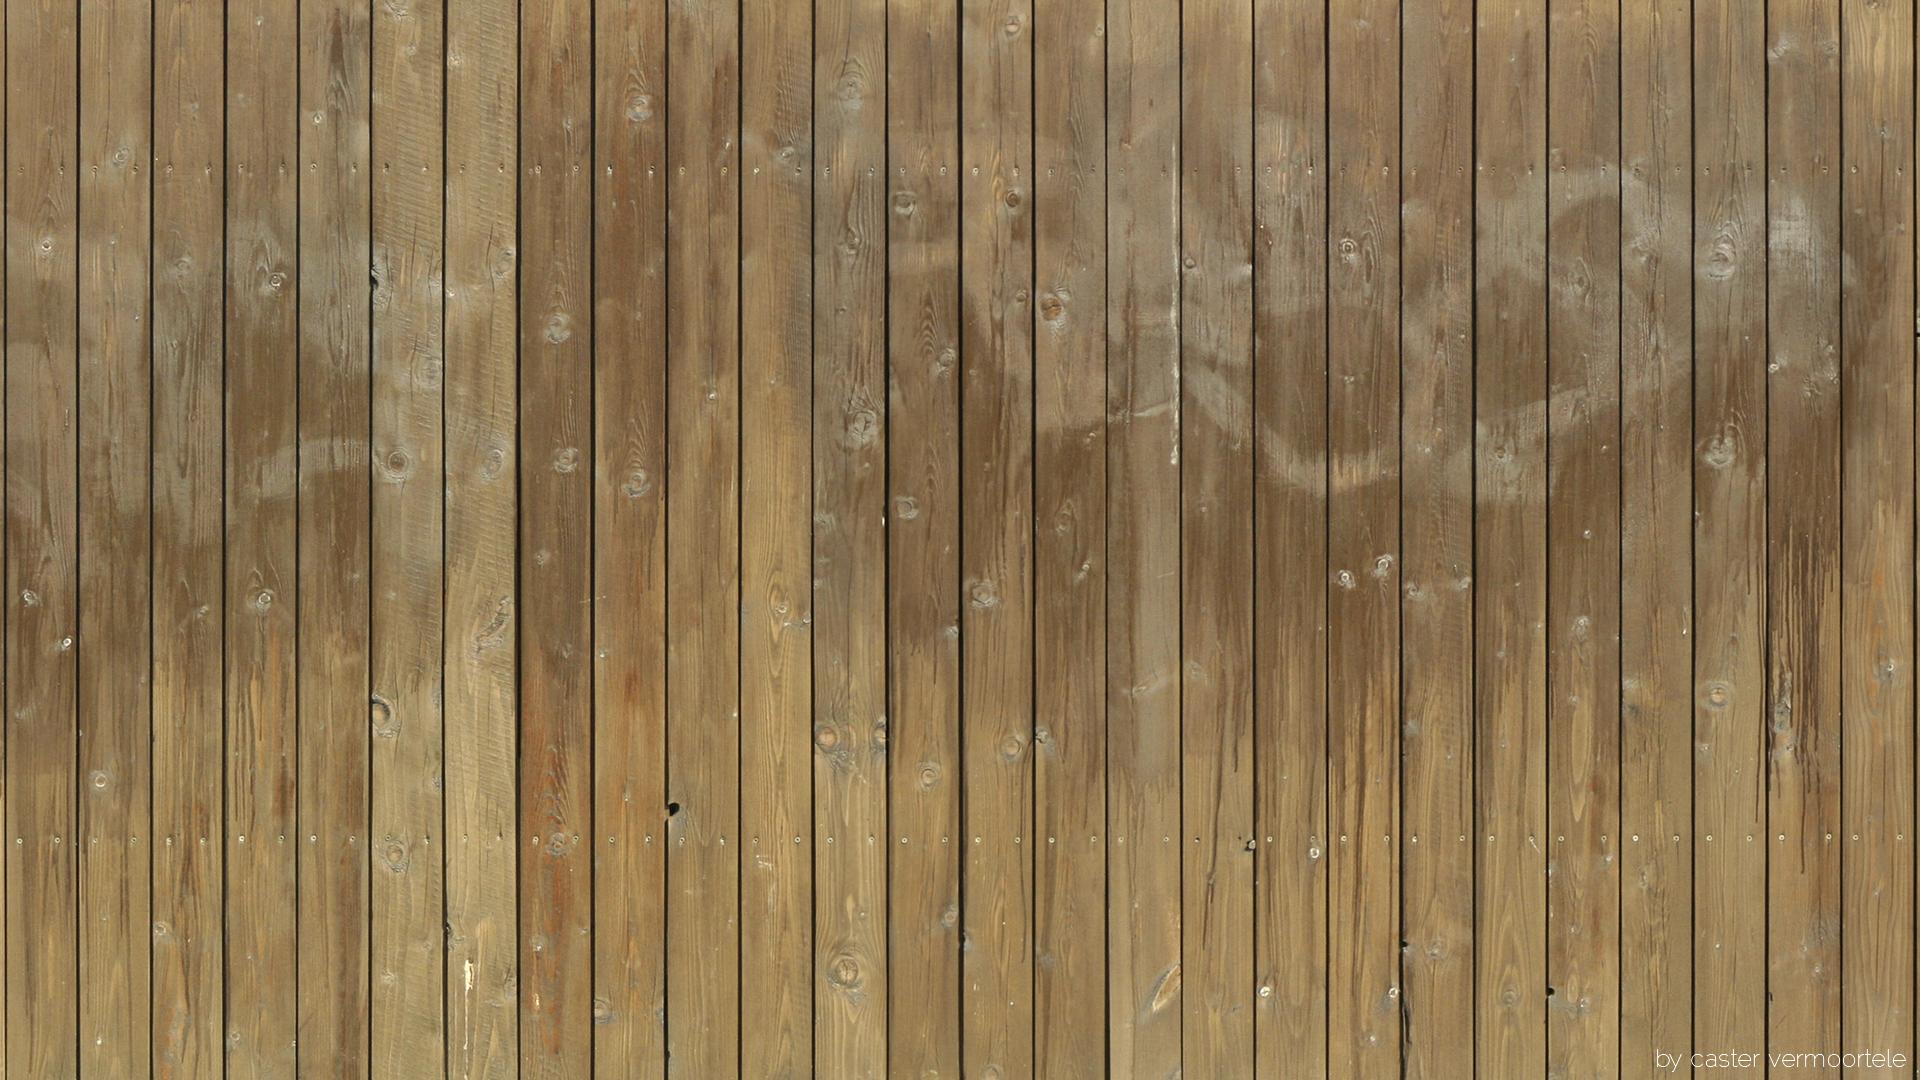 Wood background texture wooden tiles free image wood background -  Tile Texture Best Free Seamless Wood Plank Dark Wooden Floor Texture Seamless Wallpaper On Floors Wallpapersafari